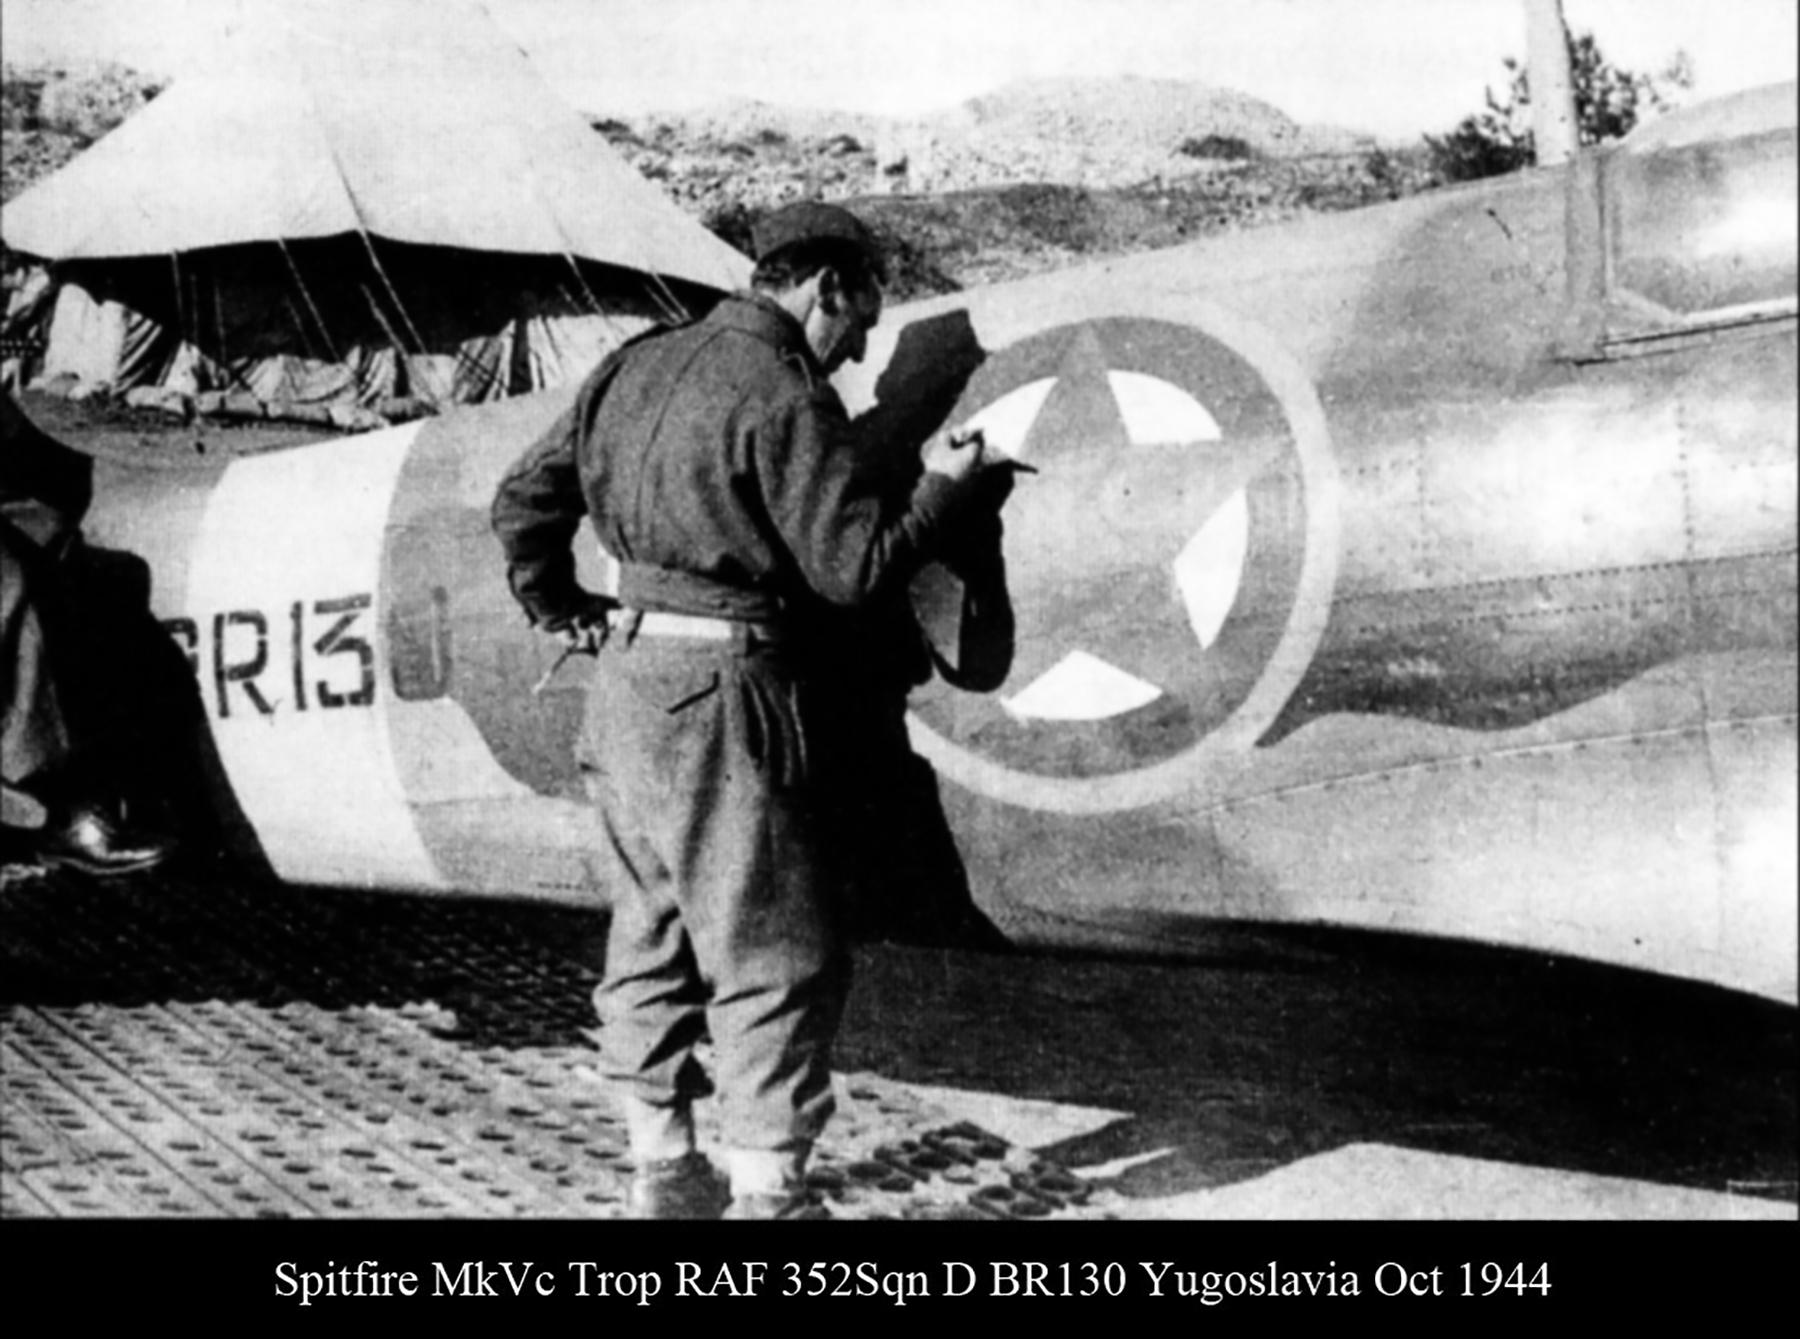 Spitfire MkVcTrop RAF 352Sqn D BR130 Yugoslavia Oct 1944 03